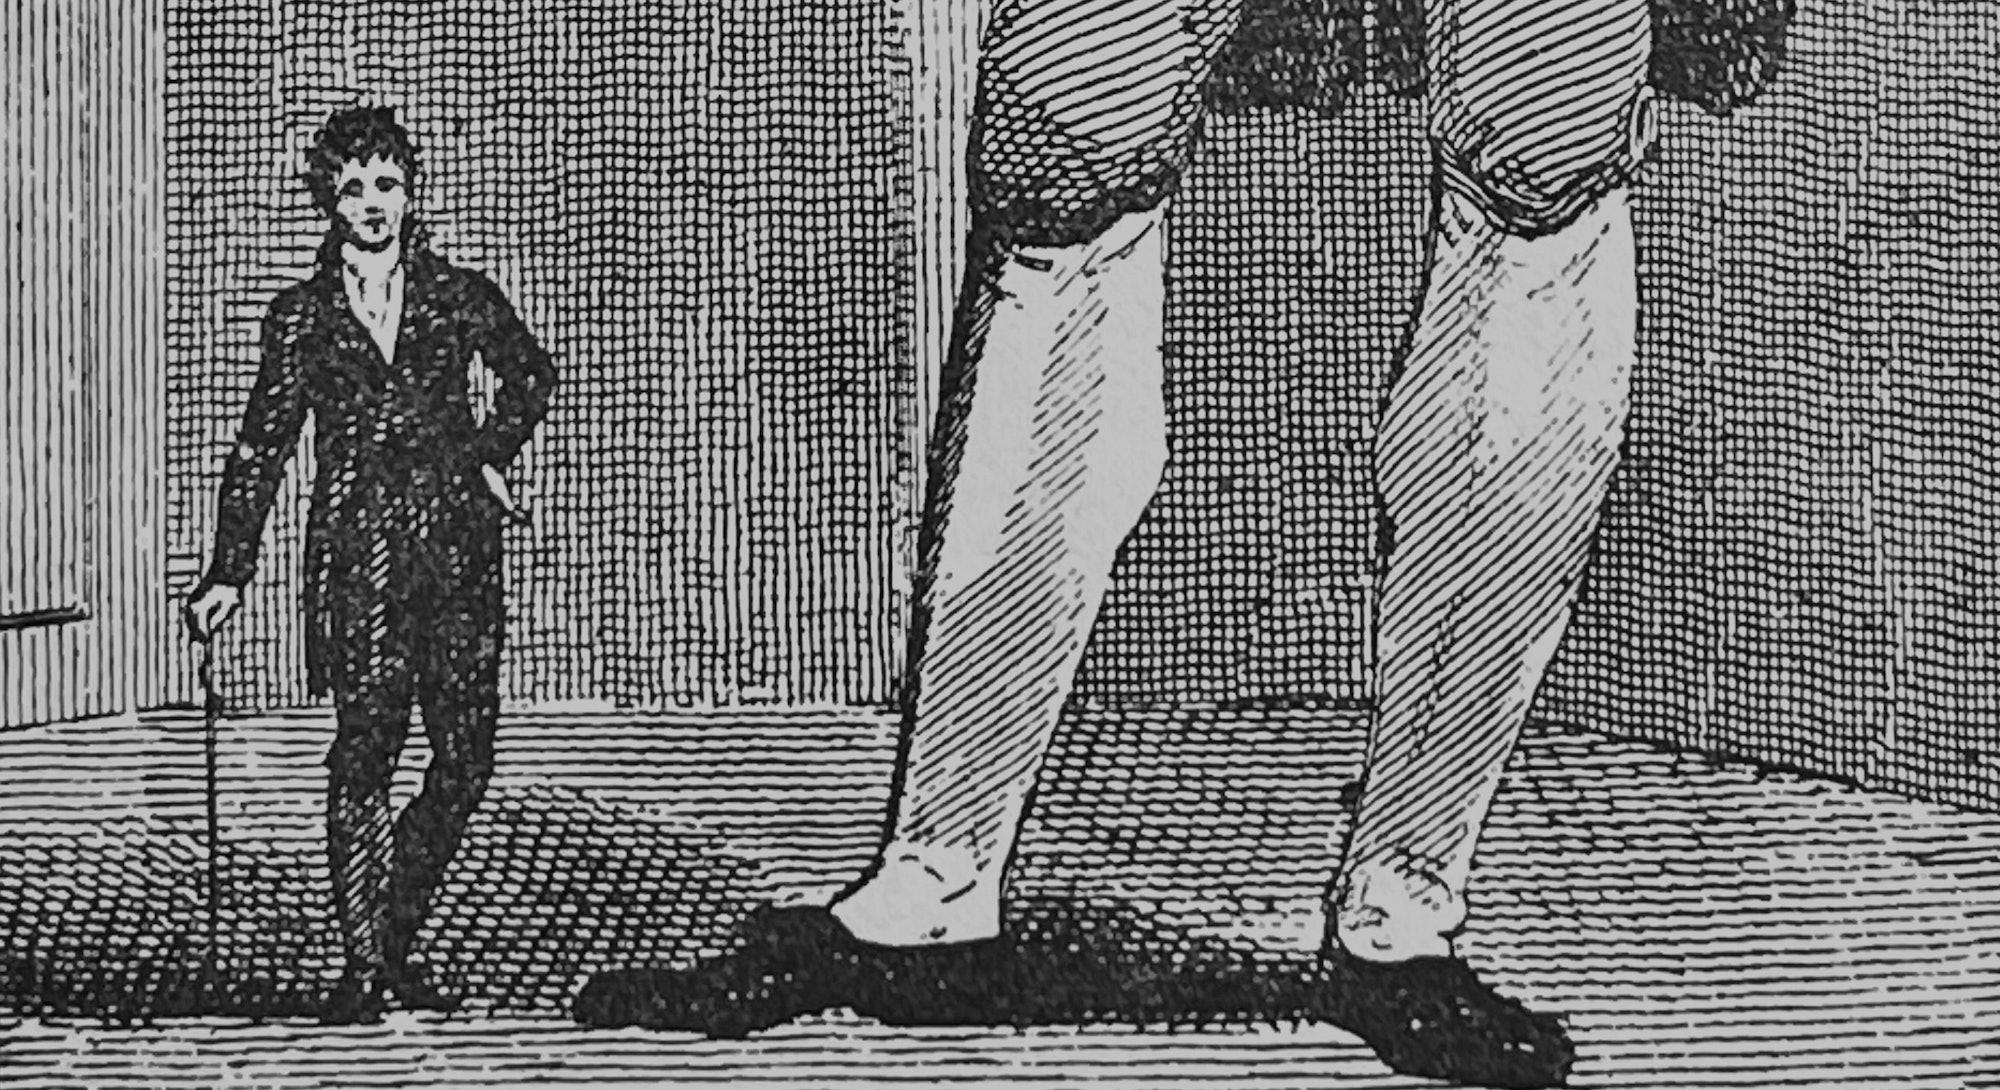 tall man and really short man illustration